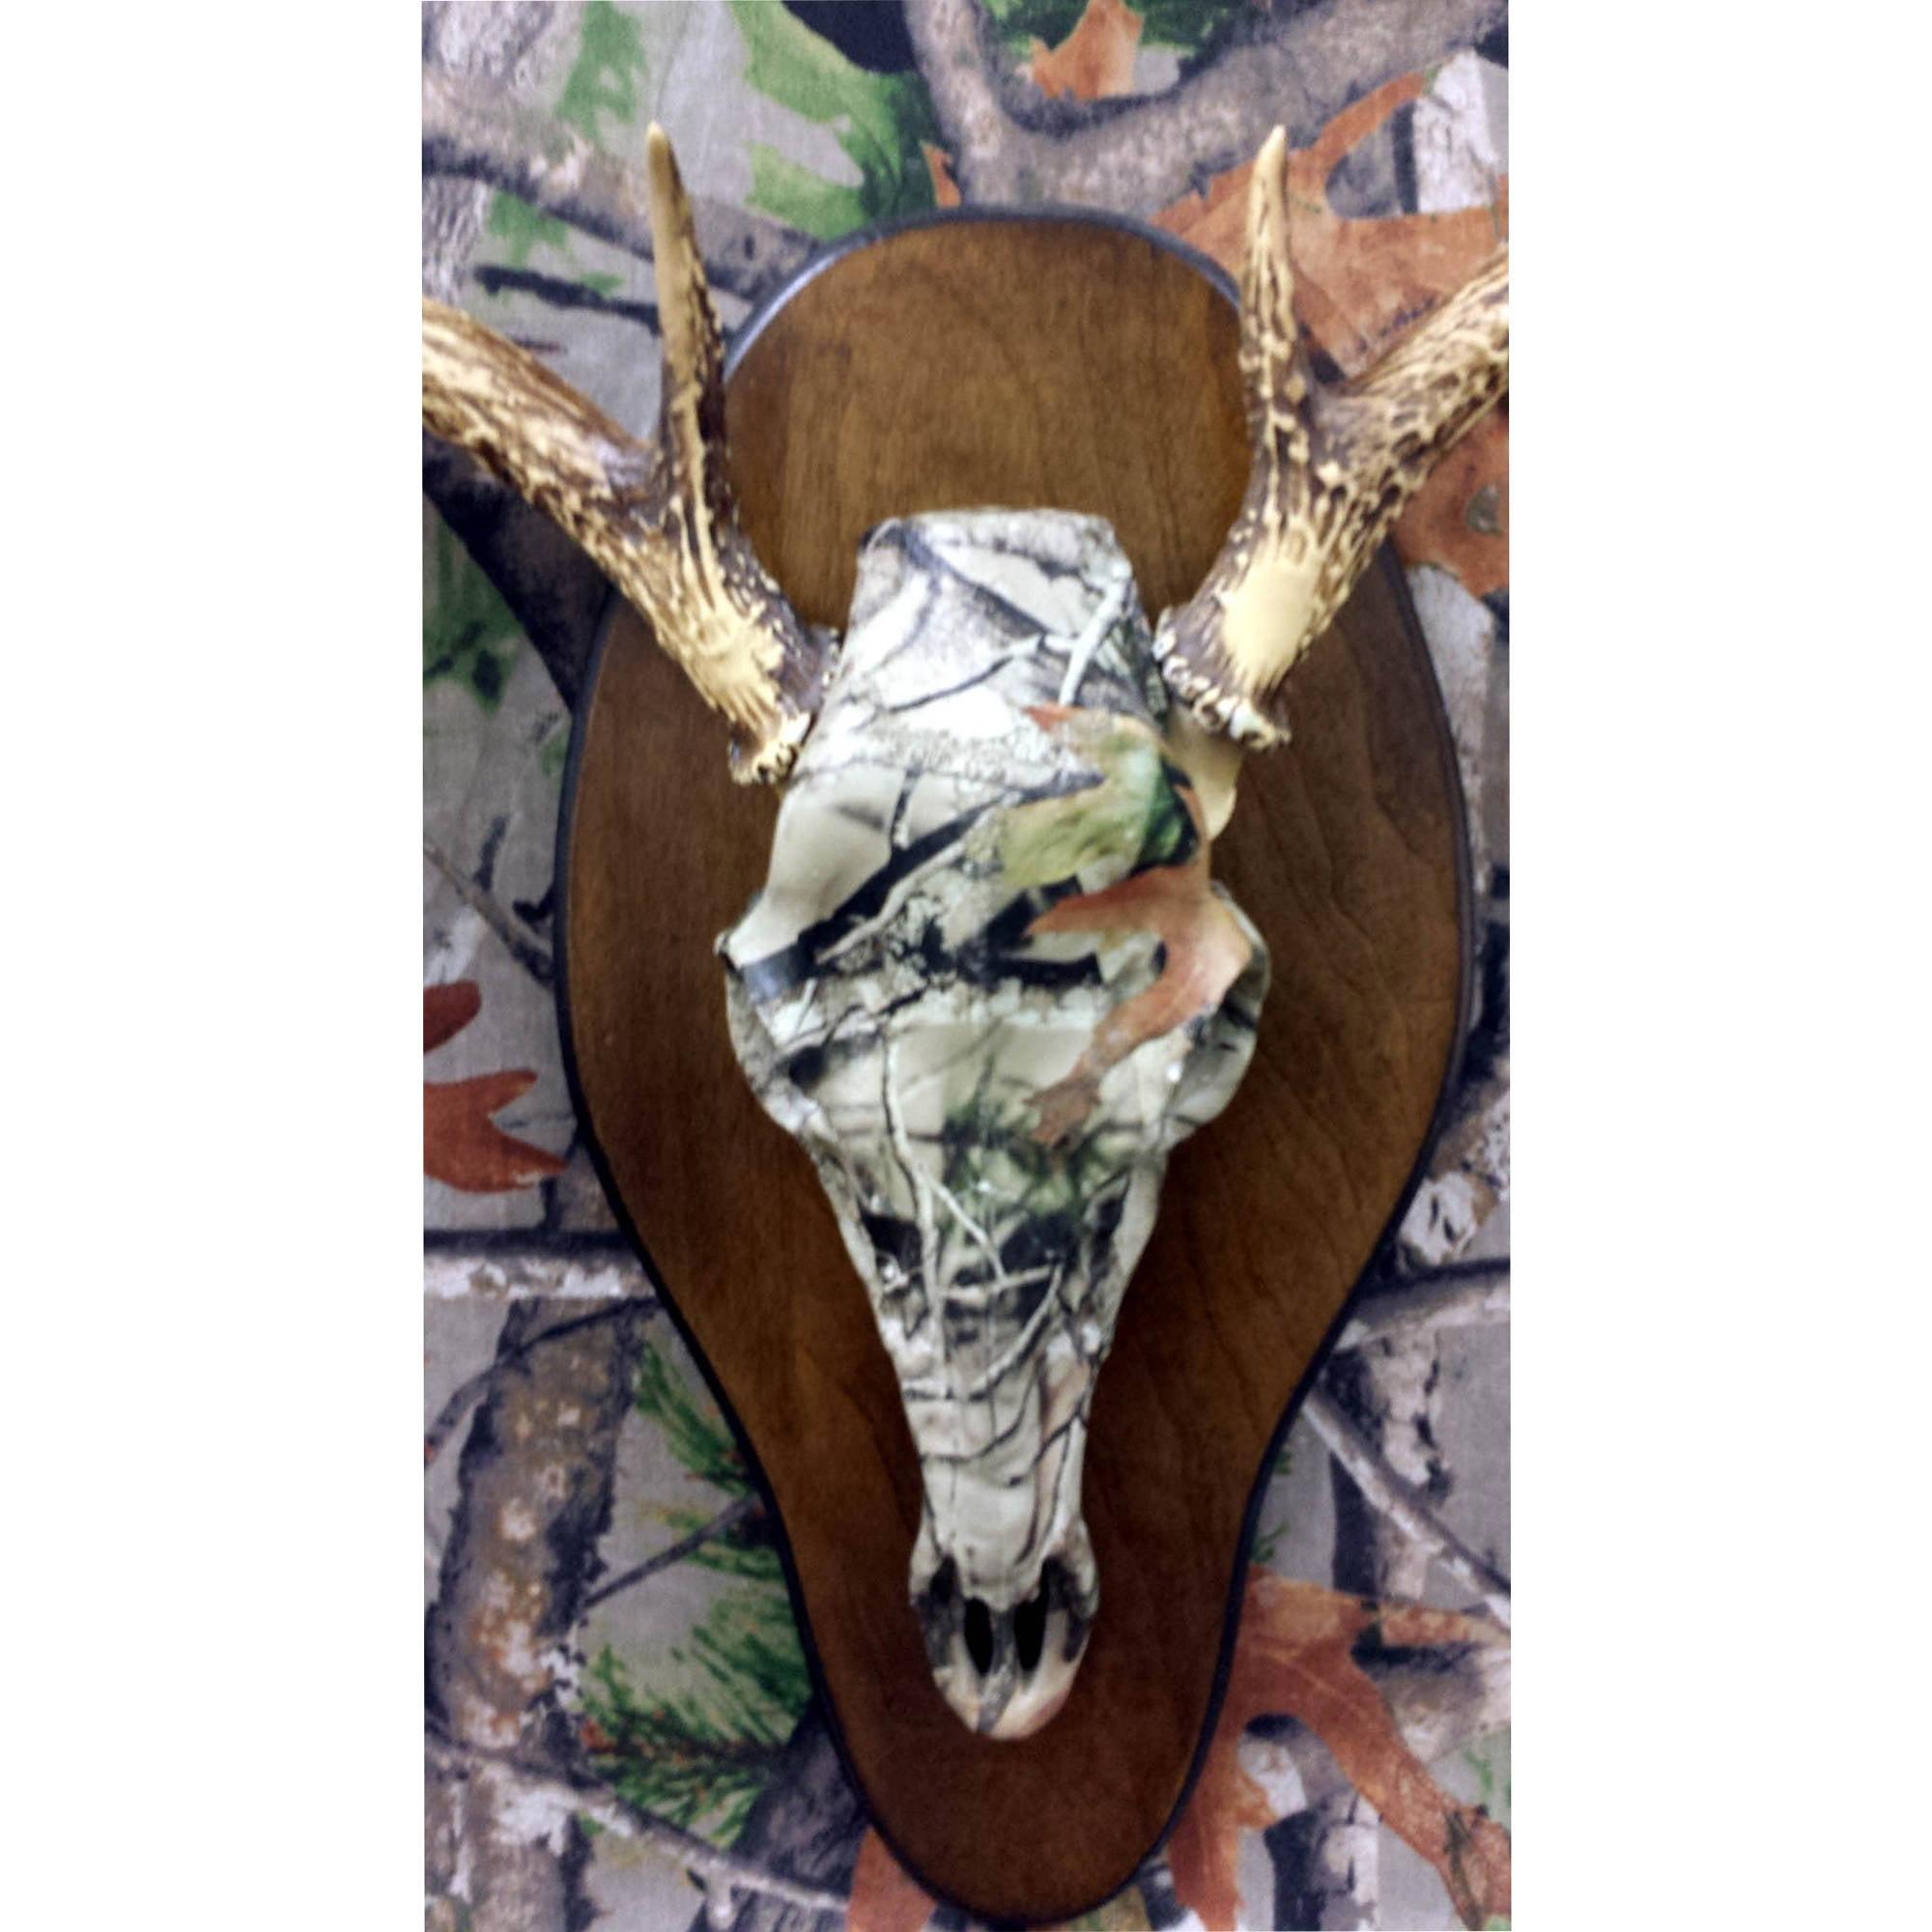 Deer antler mounting kit instructions - Mountain Mike S Skull Master Dipped Snow O Mount Kit B Pro